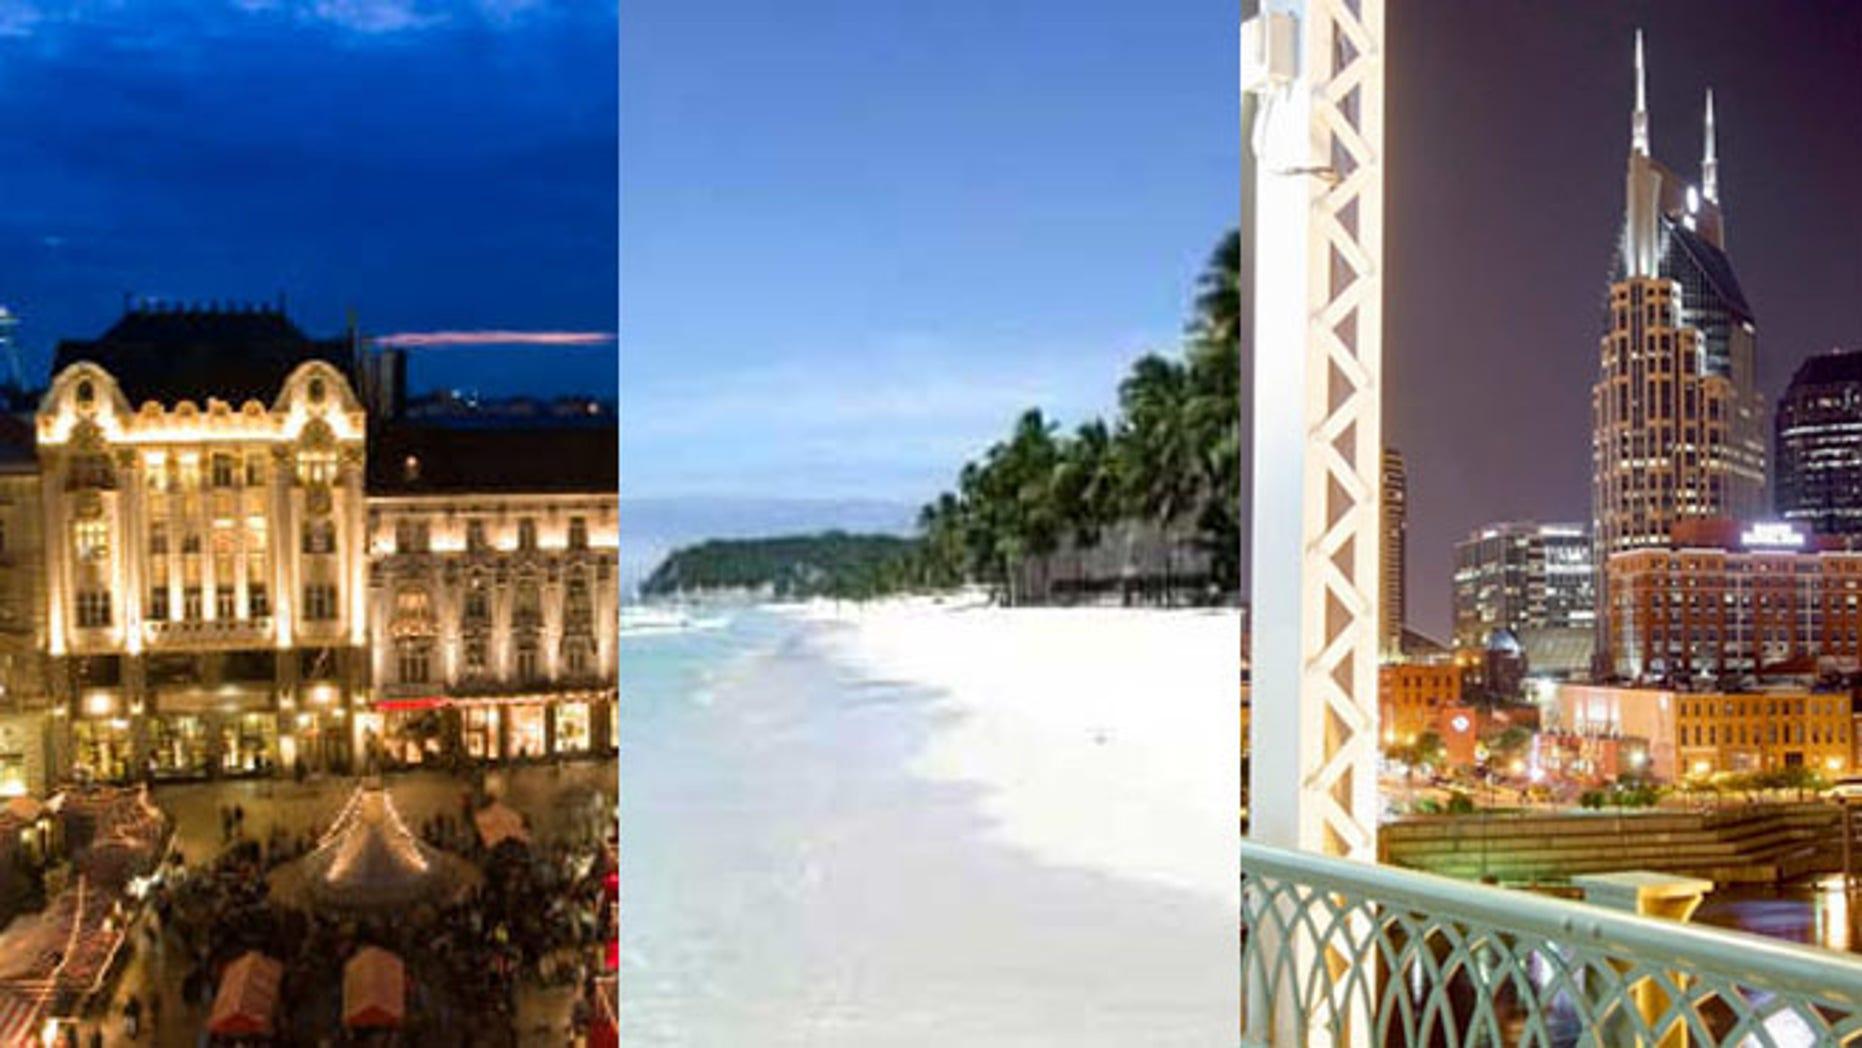 Top 2013 destinations include Bratislava,  Boracay Island and closer to home --Nashville.